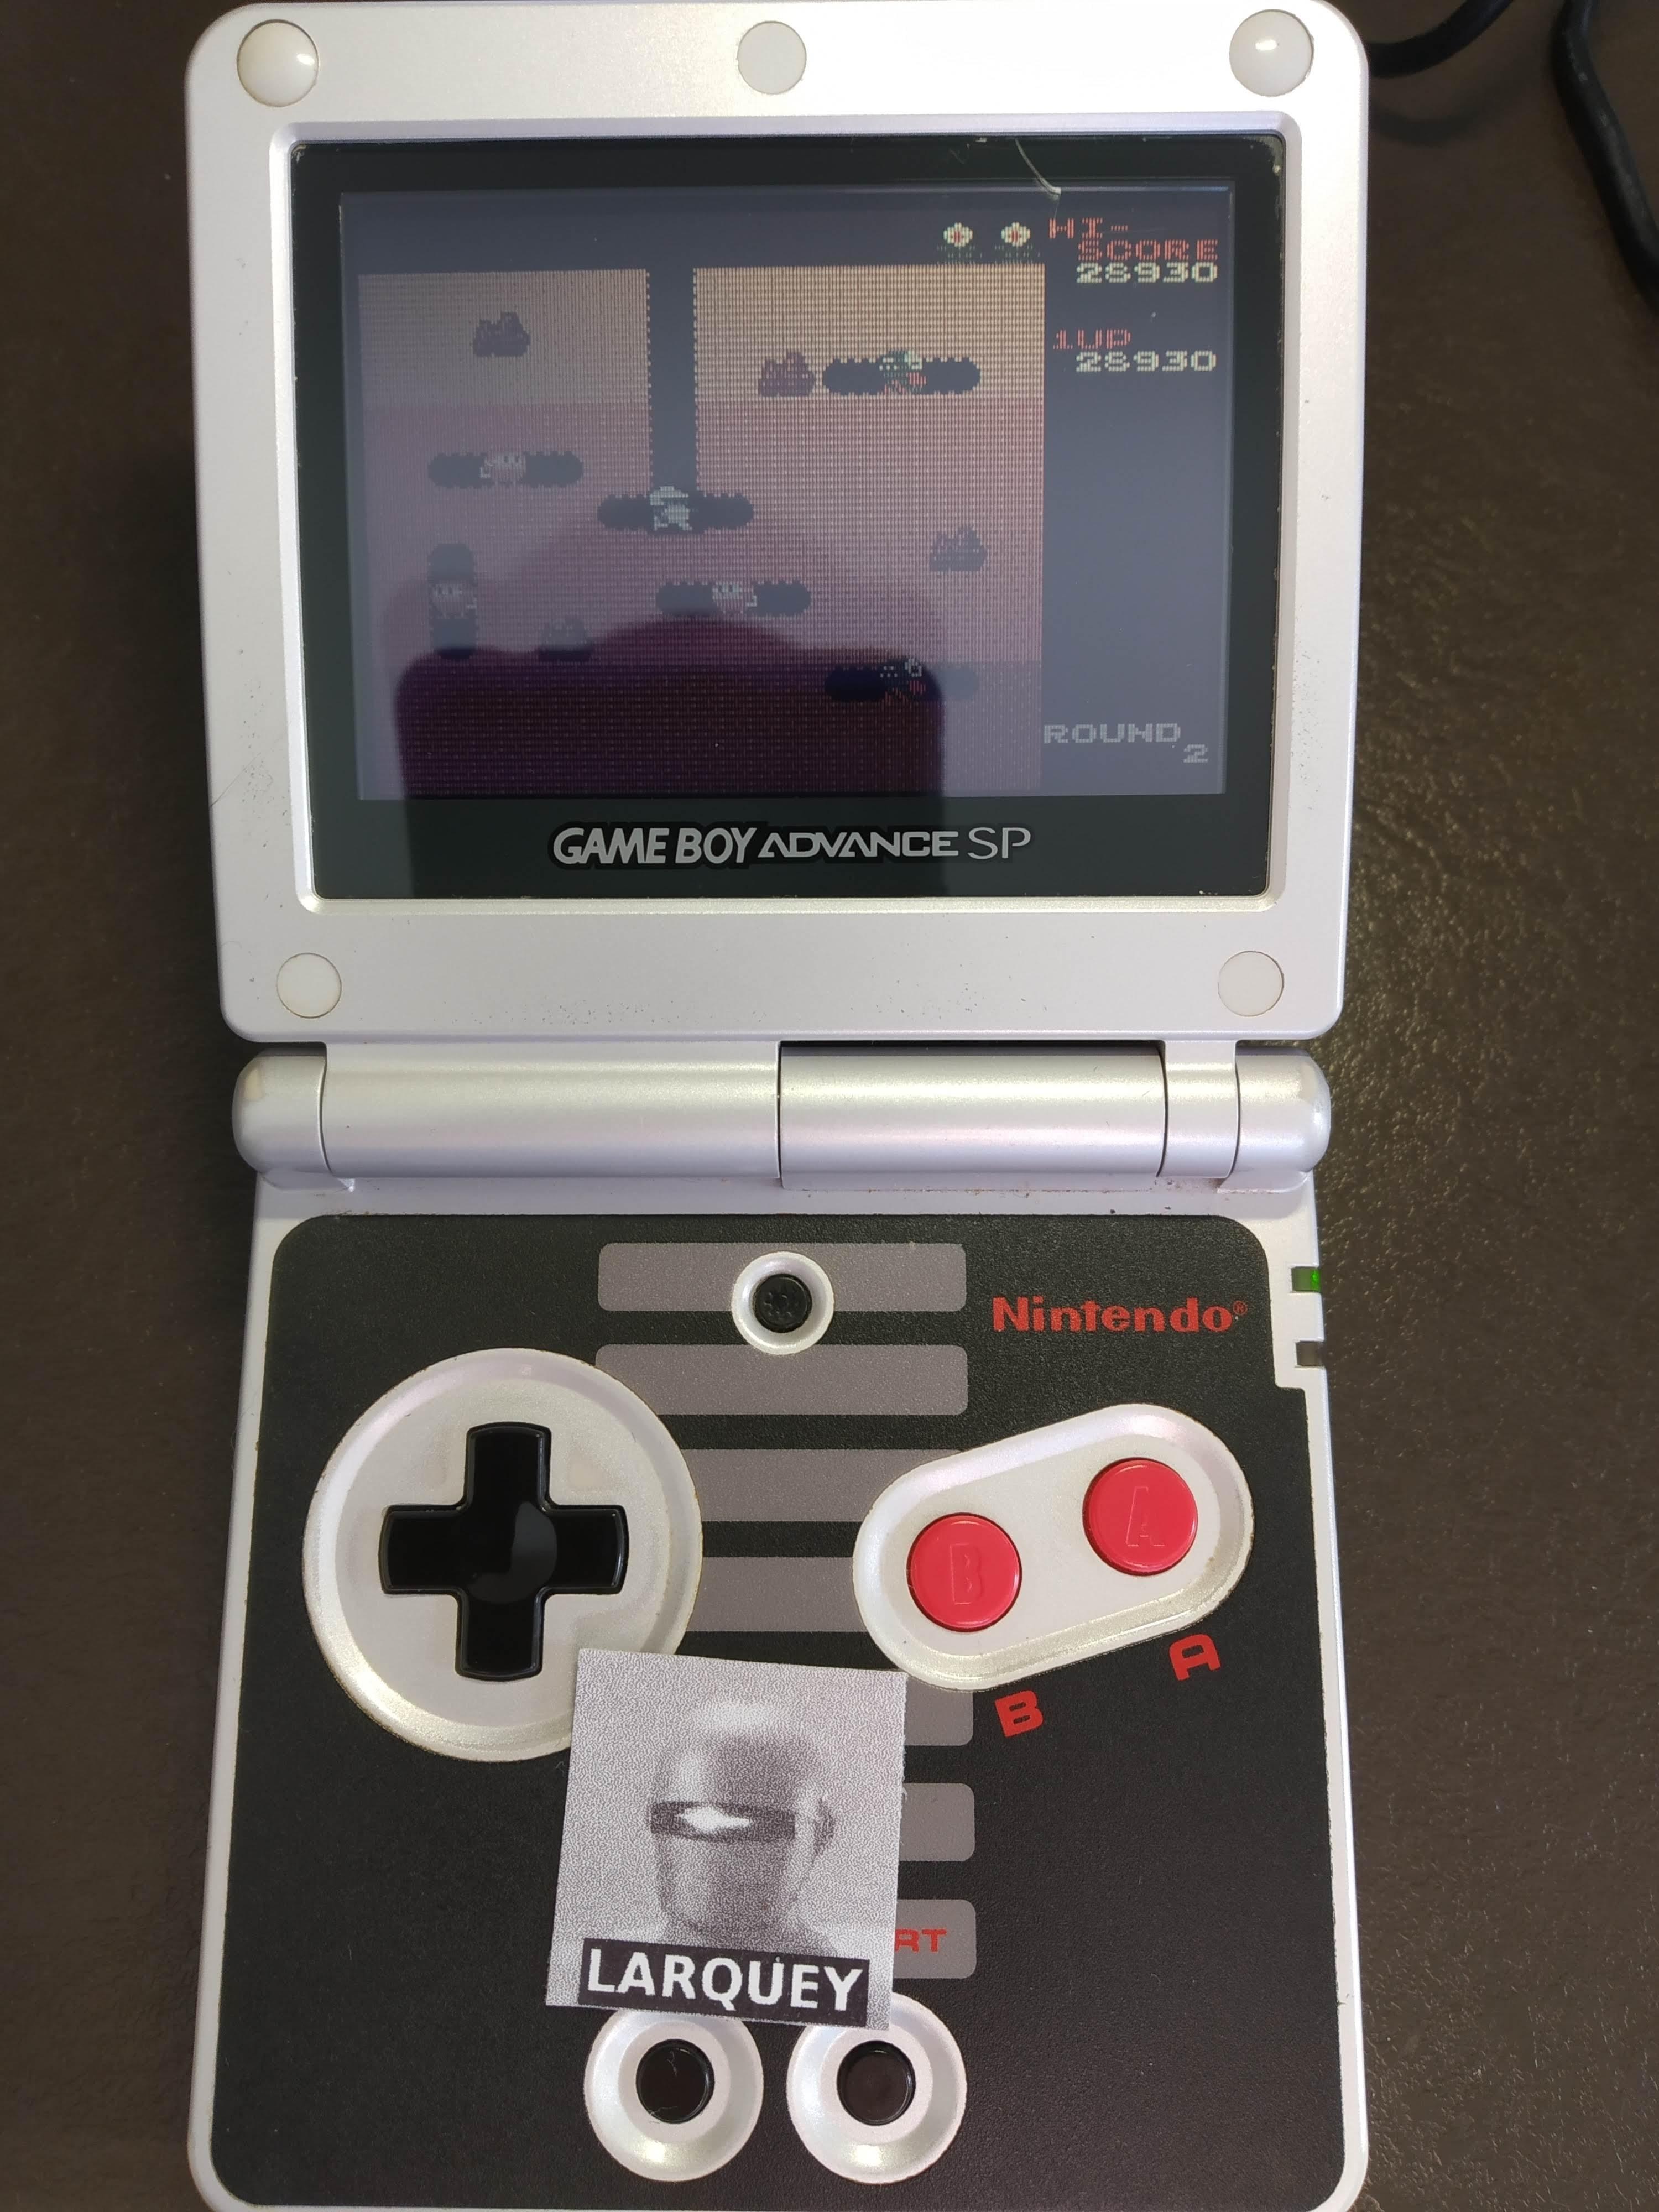 Larquey: Famicom Mini Vol. 16: Dig Dug (GBA) 28,930 points on 2019-12-27 07:11:40